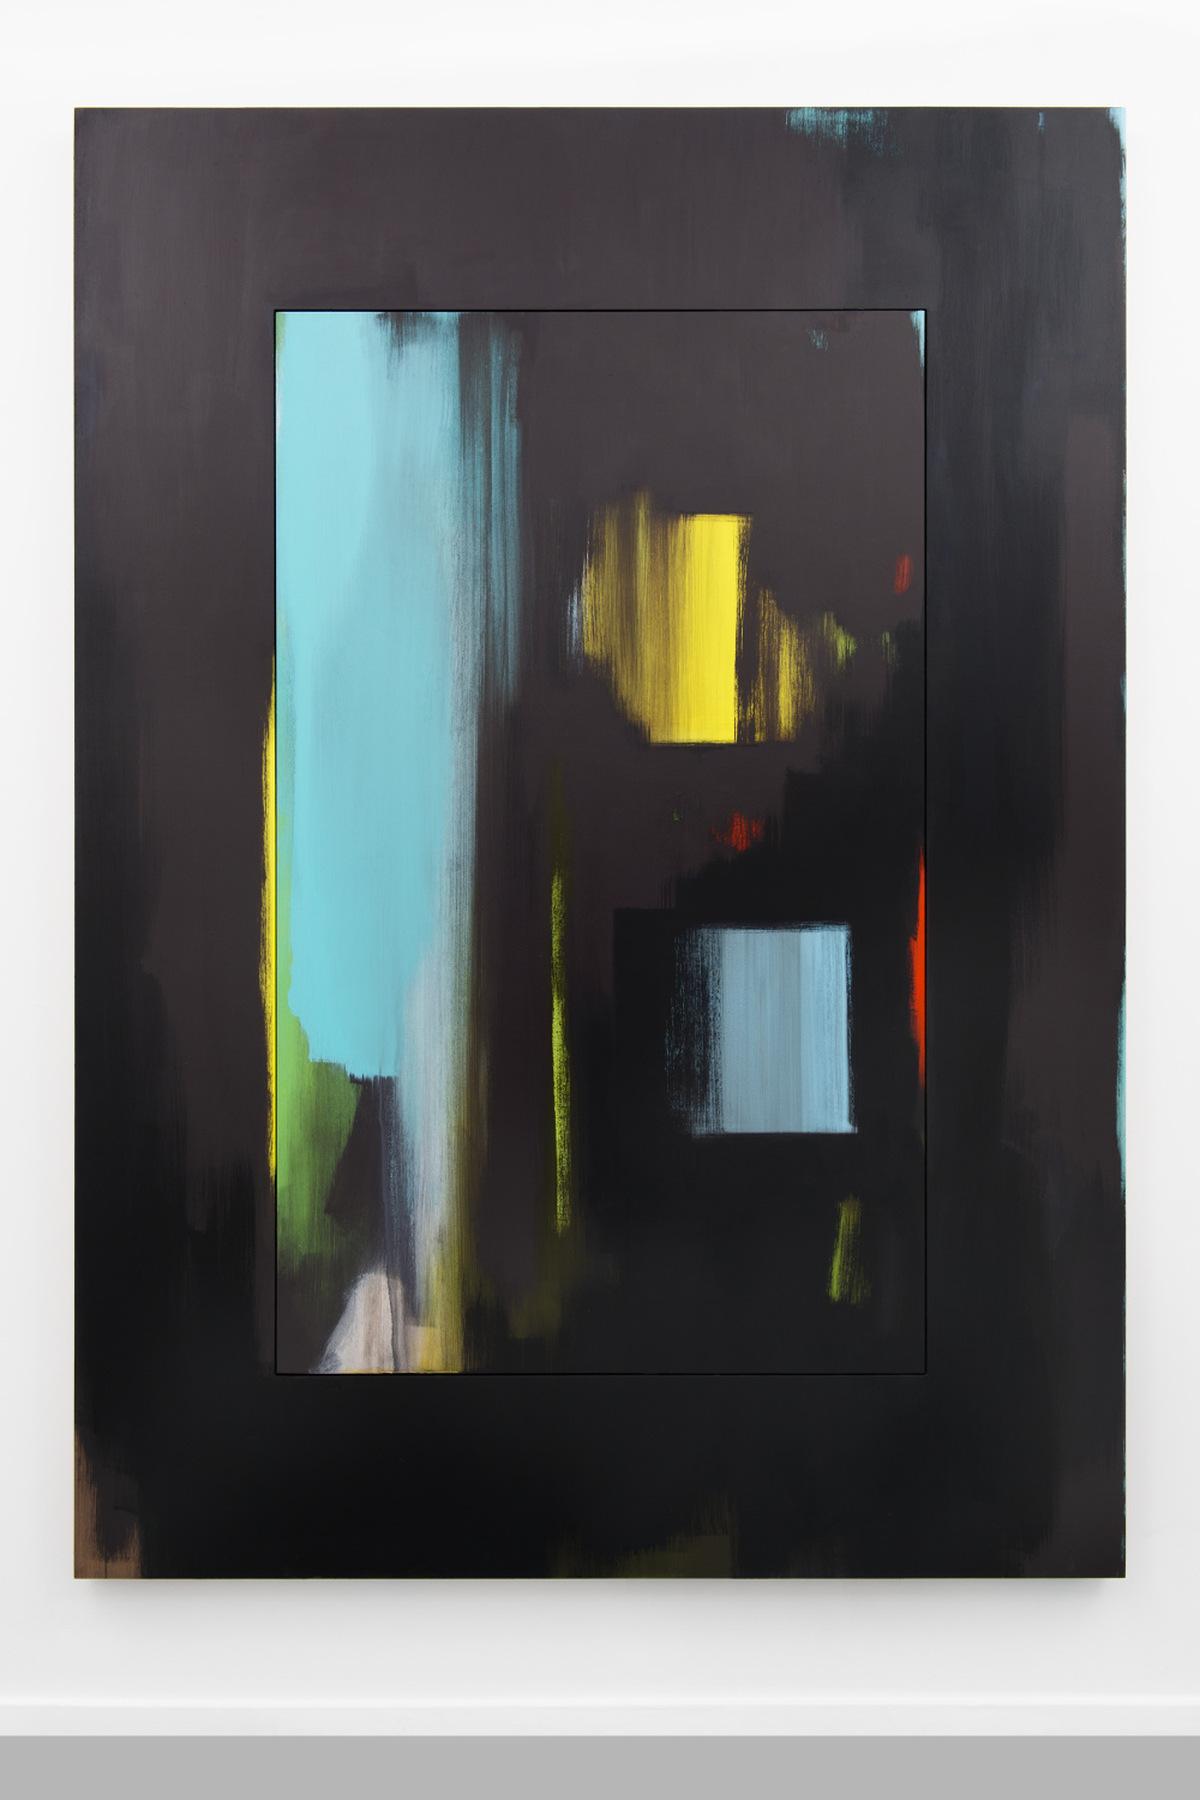 1-Esther-Tielemans-Untitled-2016-Acrylic on panel-210x150cm-image-courtesy-CINNNAMON-Rotterdam